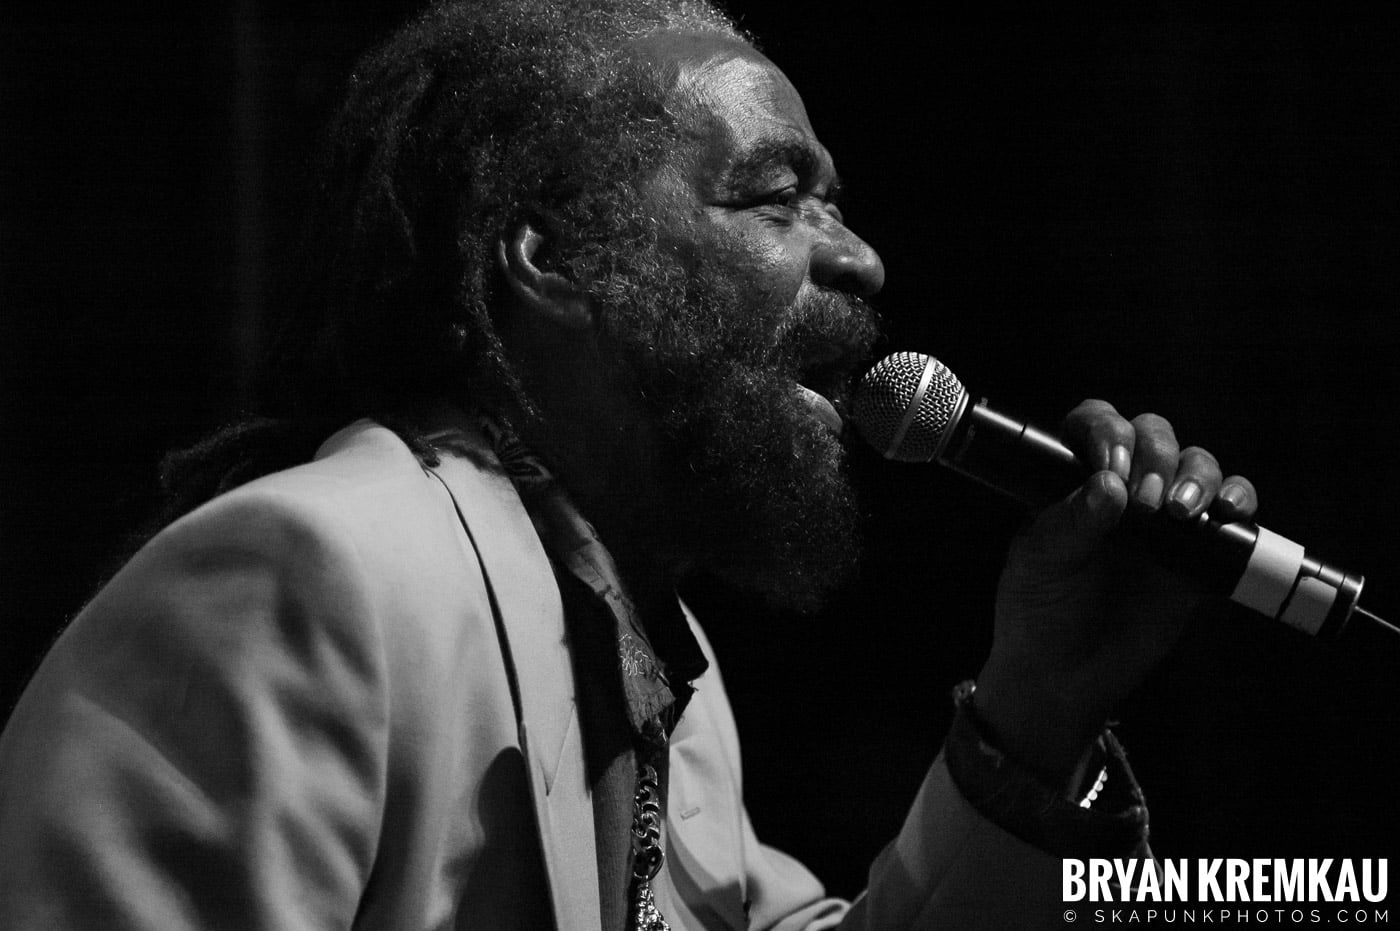 John Holt @ Vintage Reggae Fest - Hammerstein Ballroom, NYC - 12.16.07 (7)